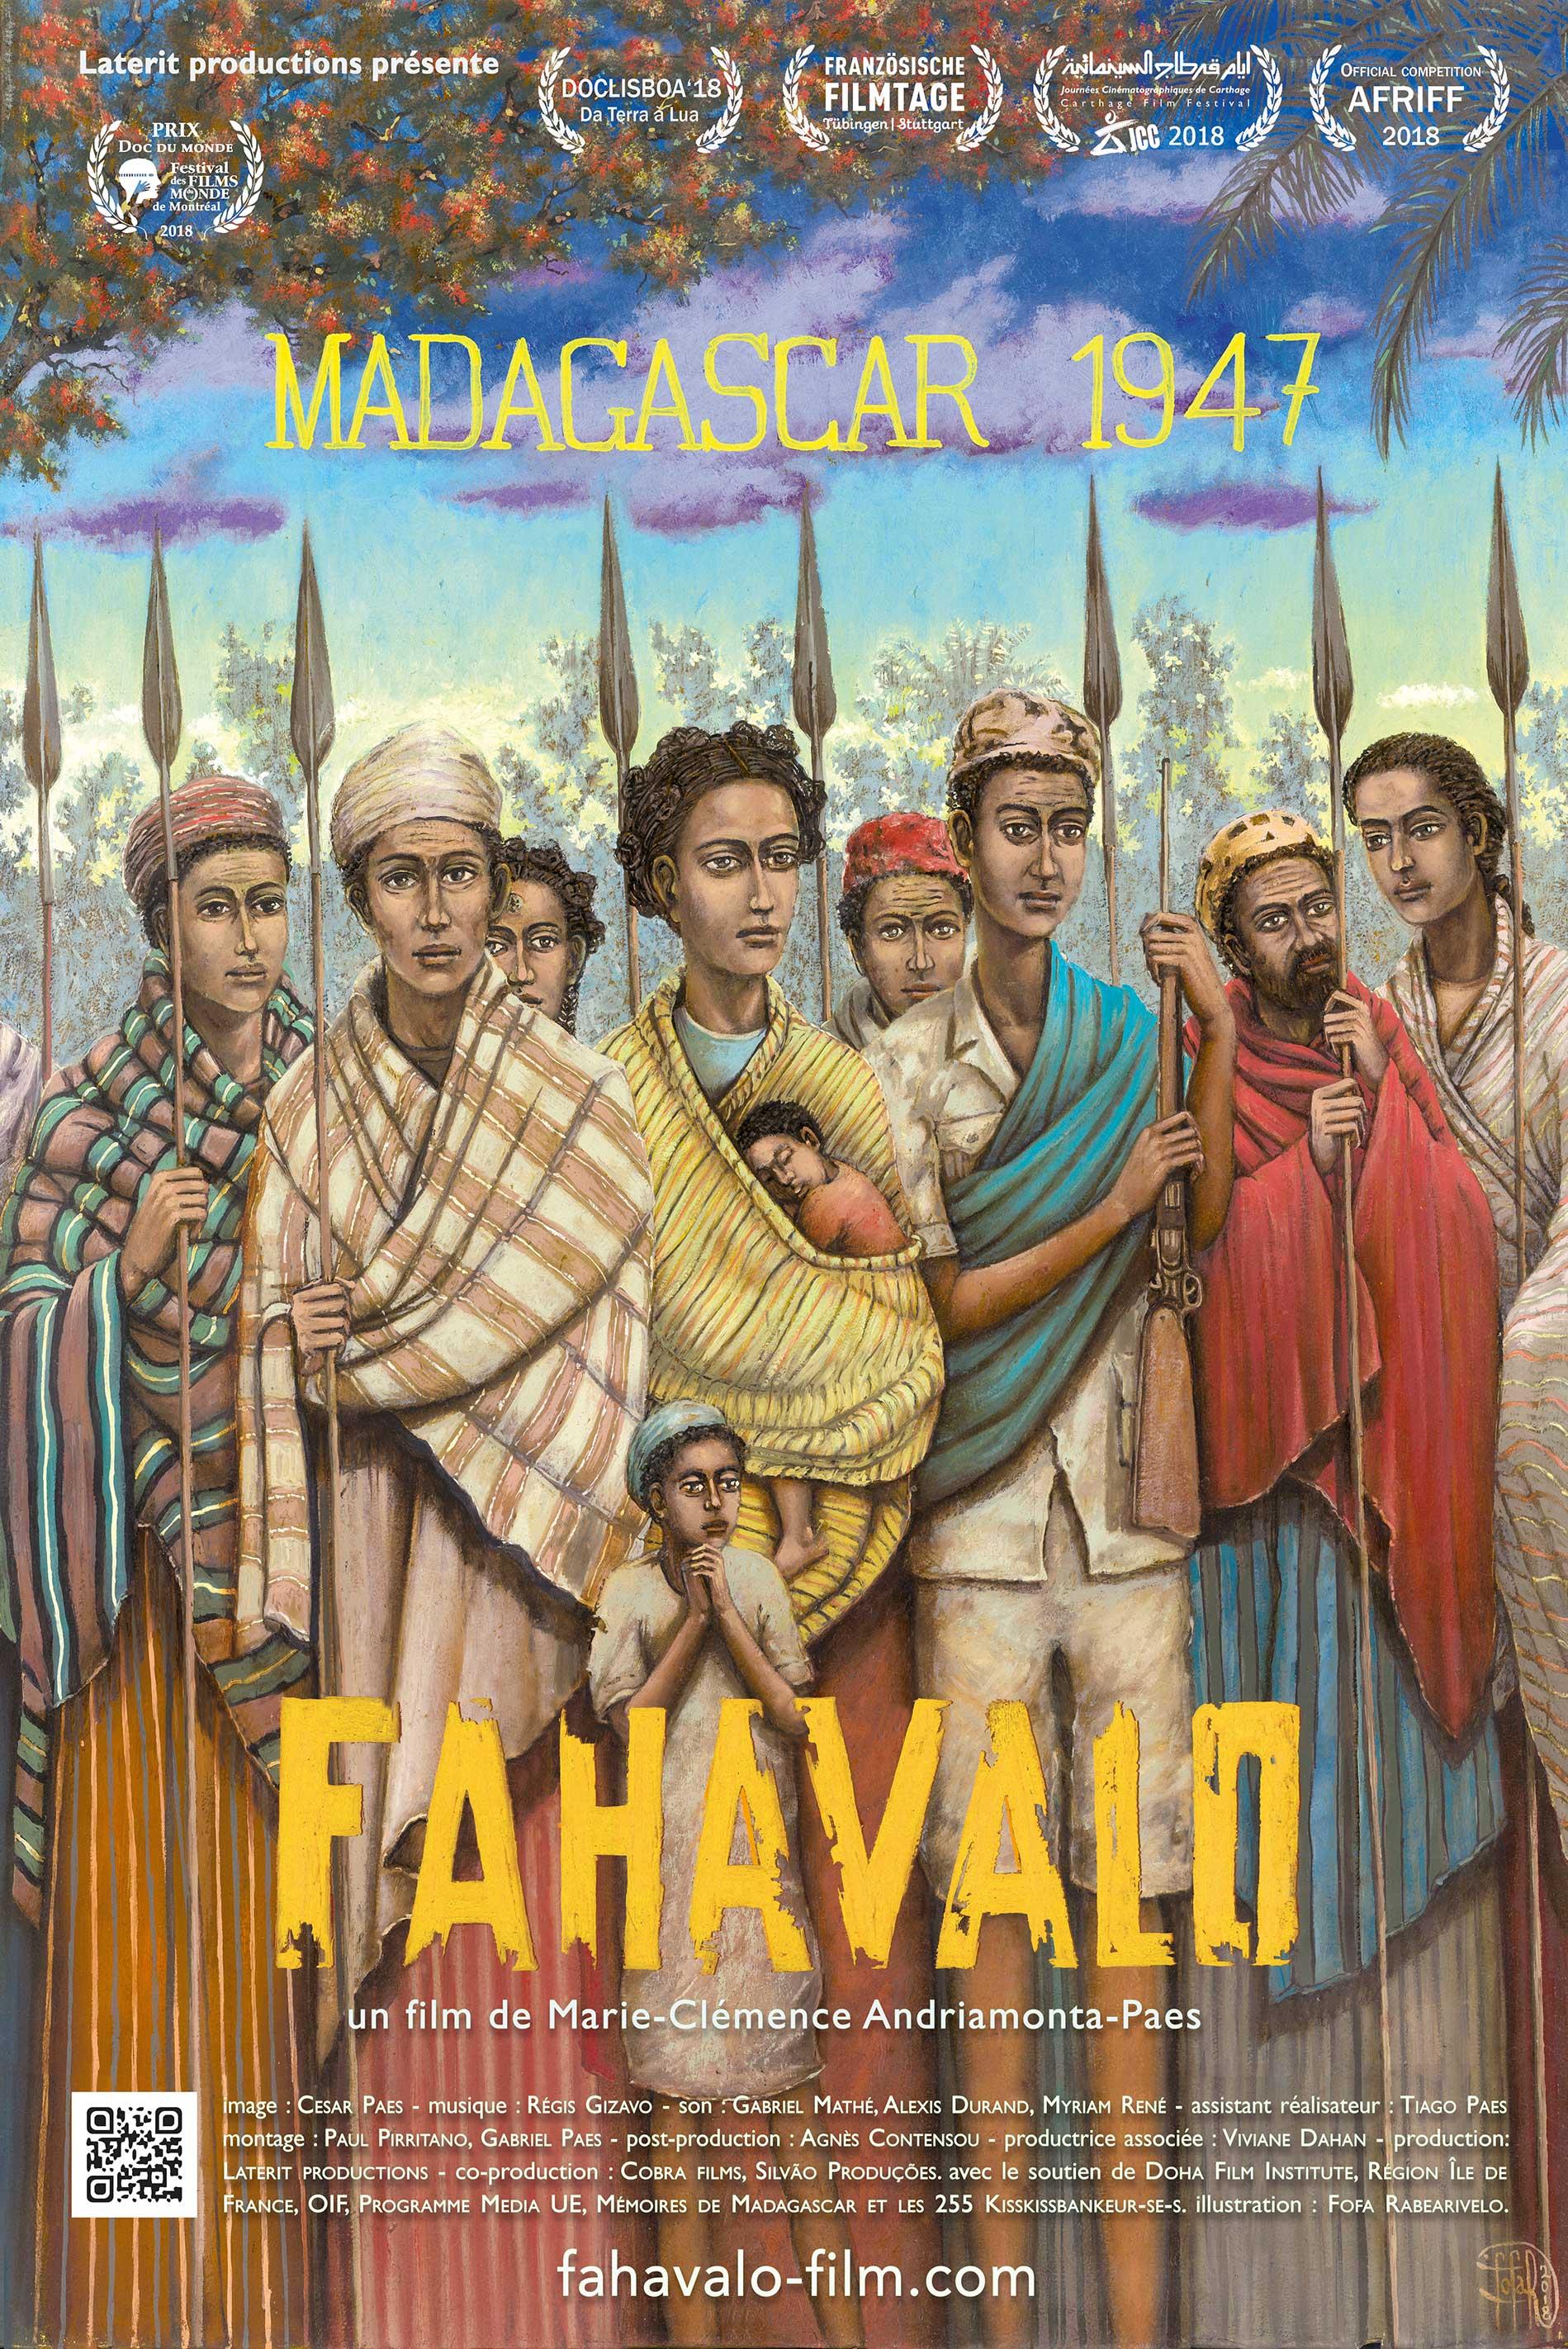 Image du film Fahavalo, Madagascar 1947